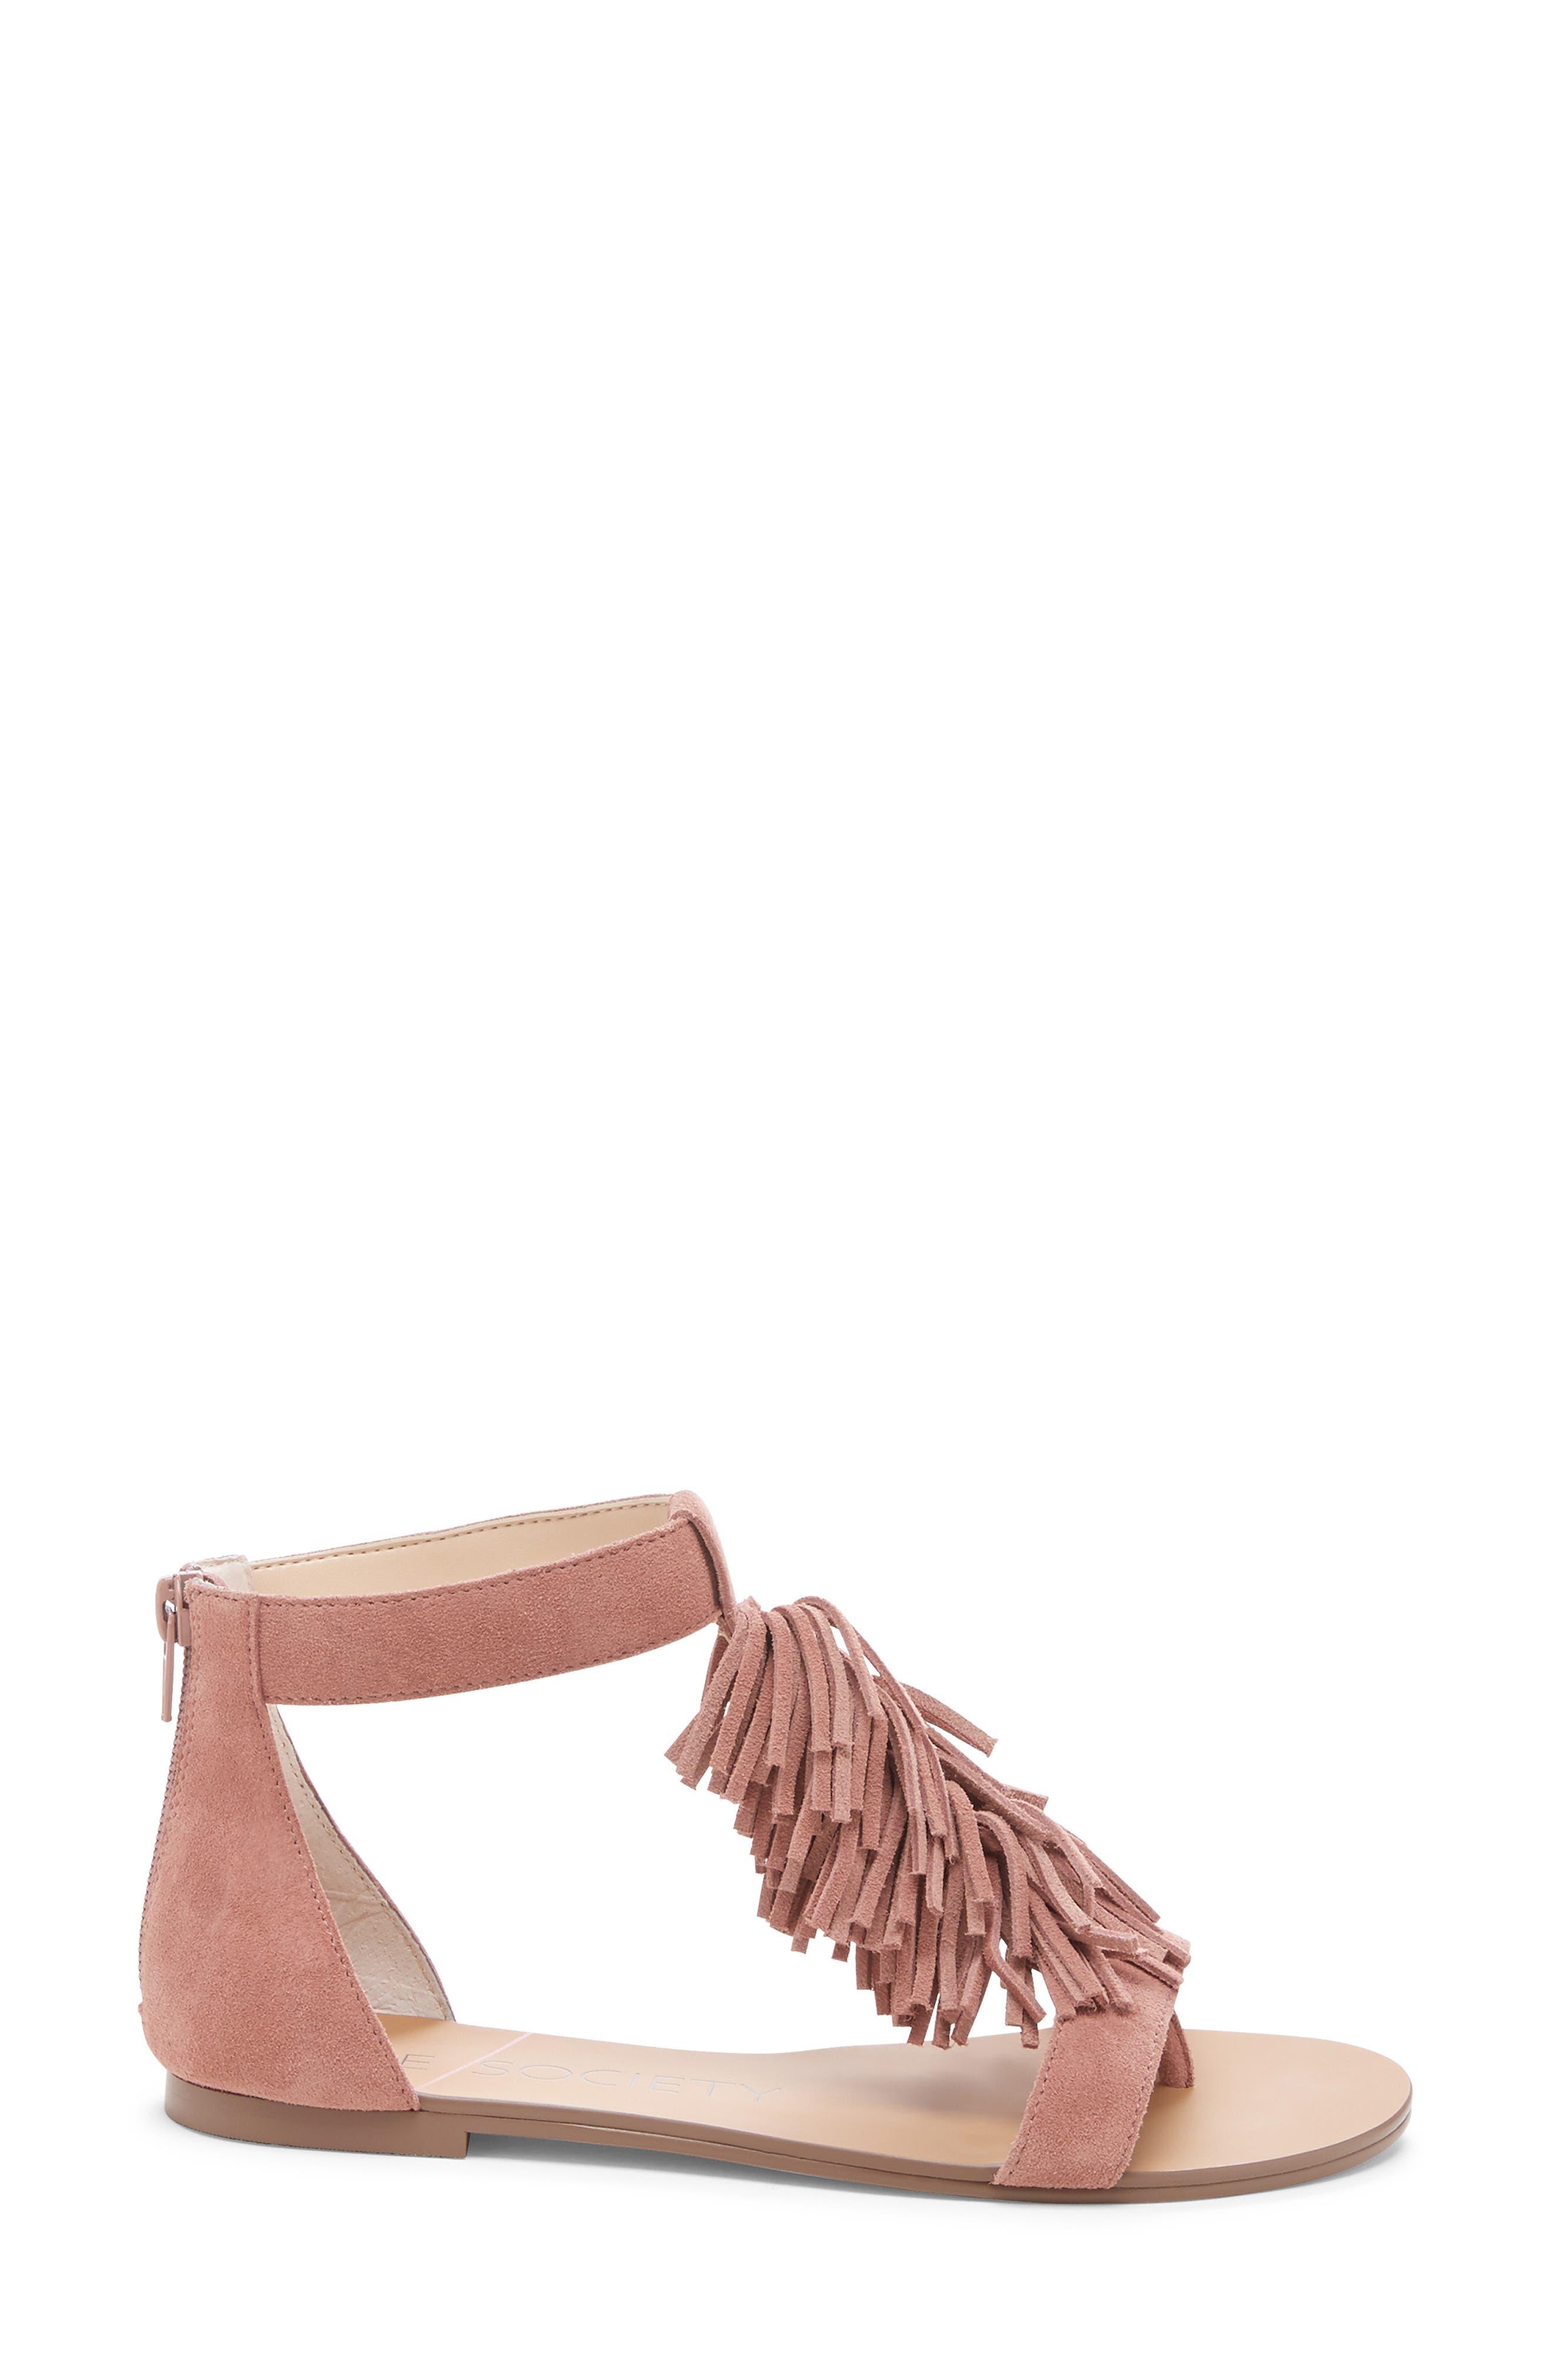 SOLE SOCIETY, 'Koa' Fringe T-Strap Flat Sandal, Alternate thumbnail 3, color, MOD MAUVE SUEDE